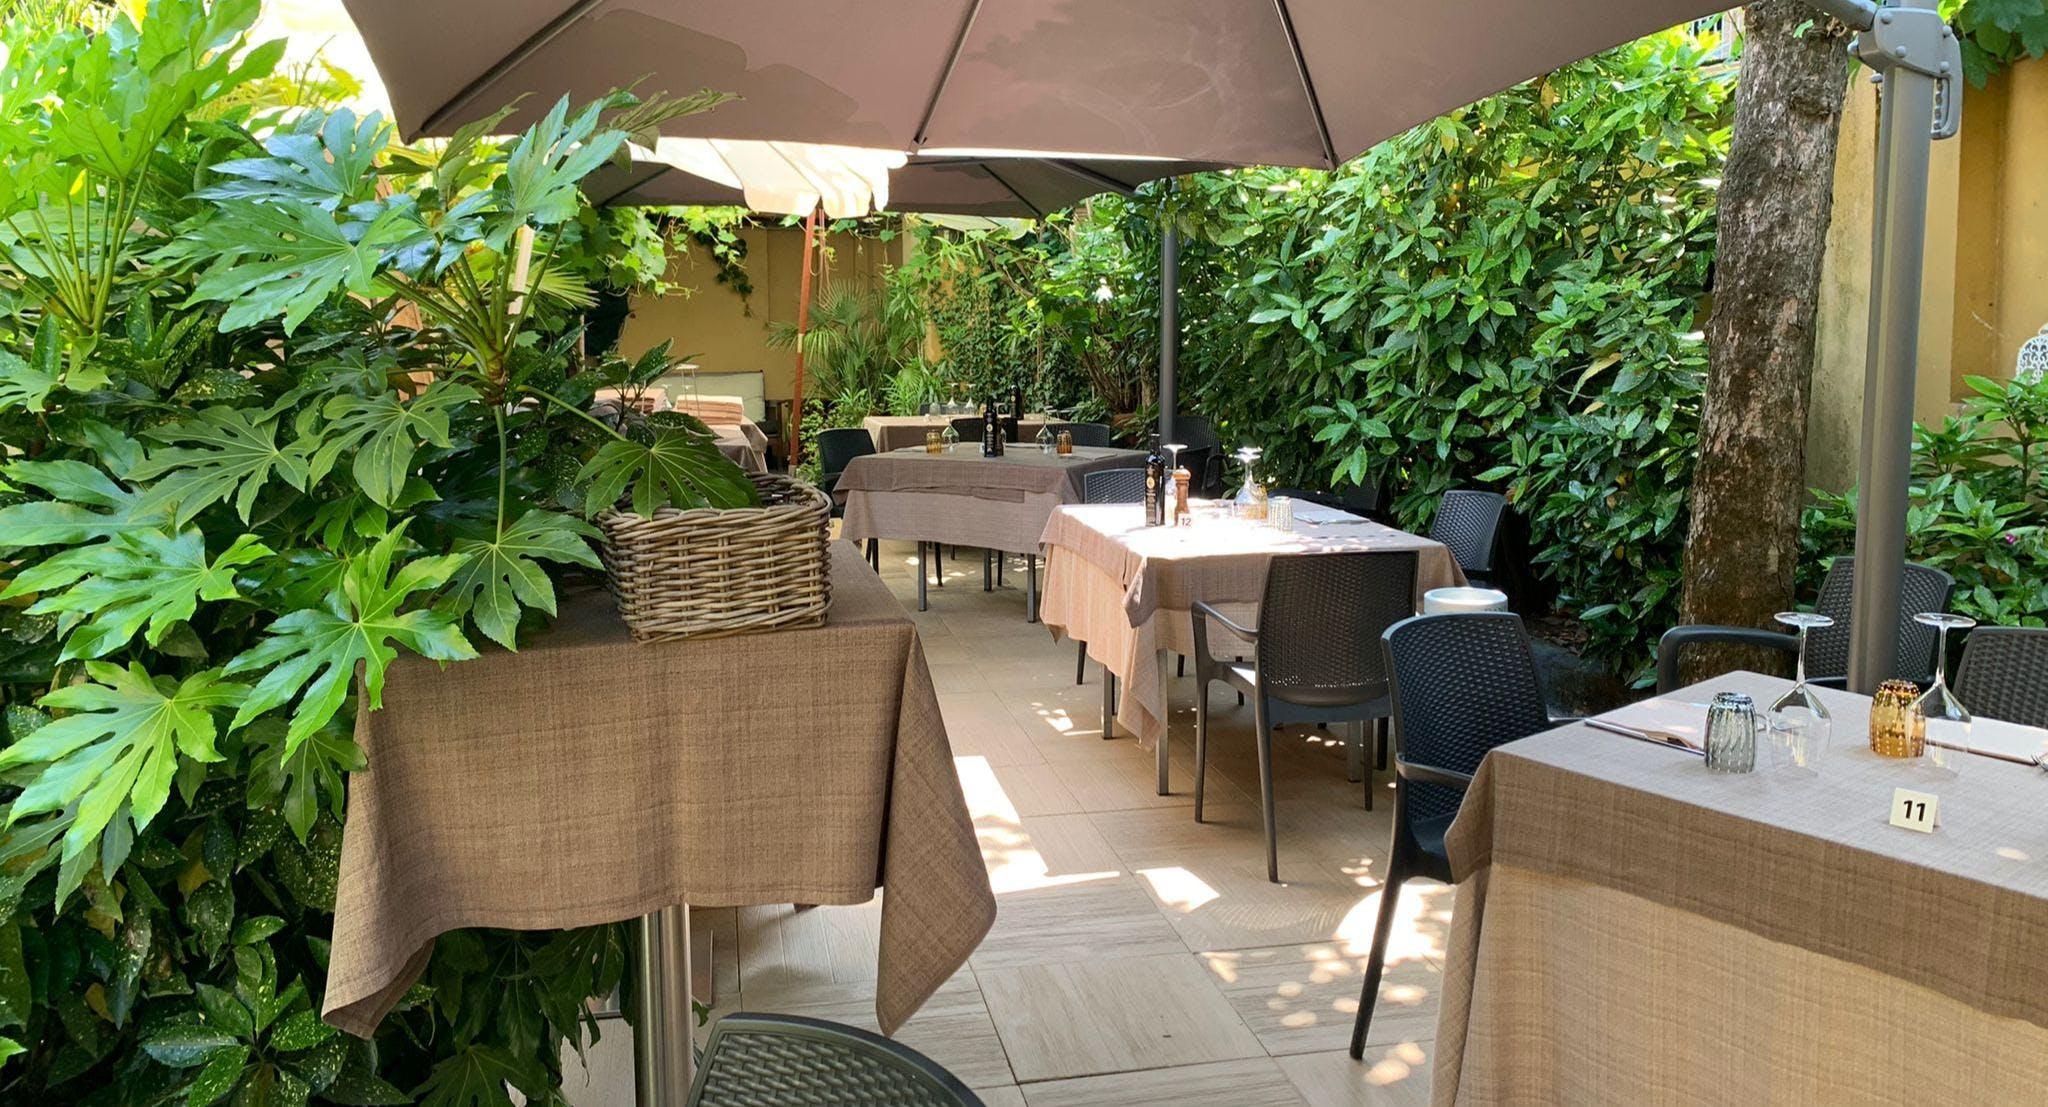 Photo of restaurant L'Angolo Nascosto in Milano Est, Milan